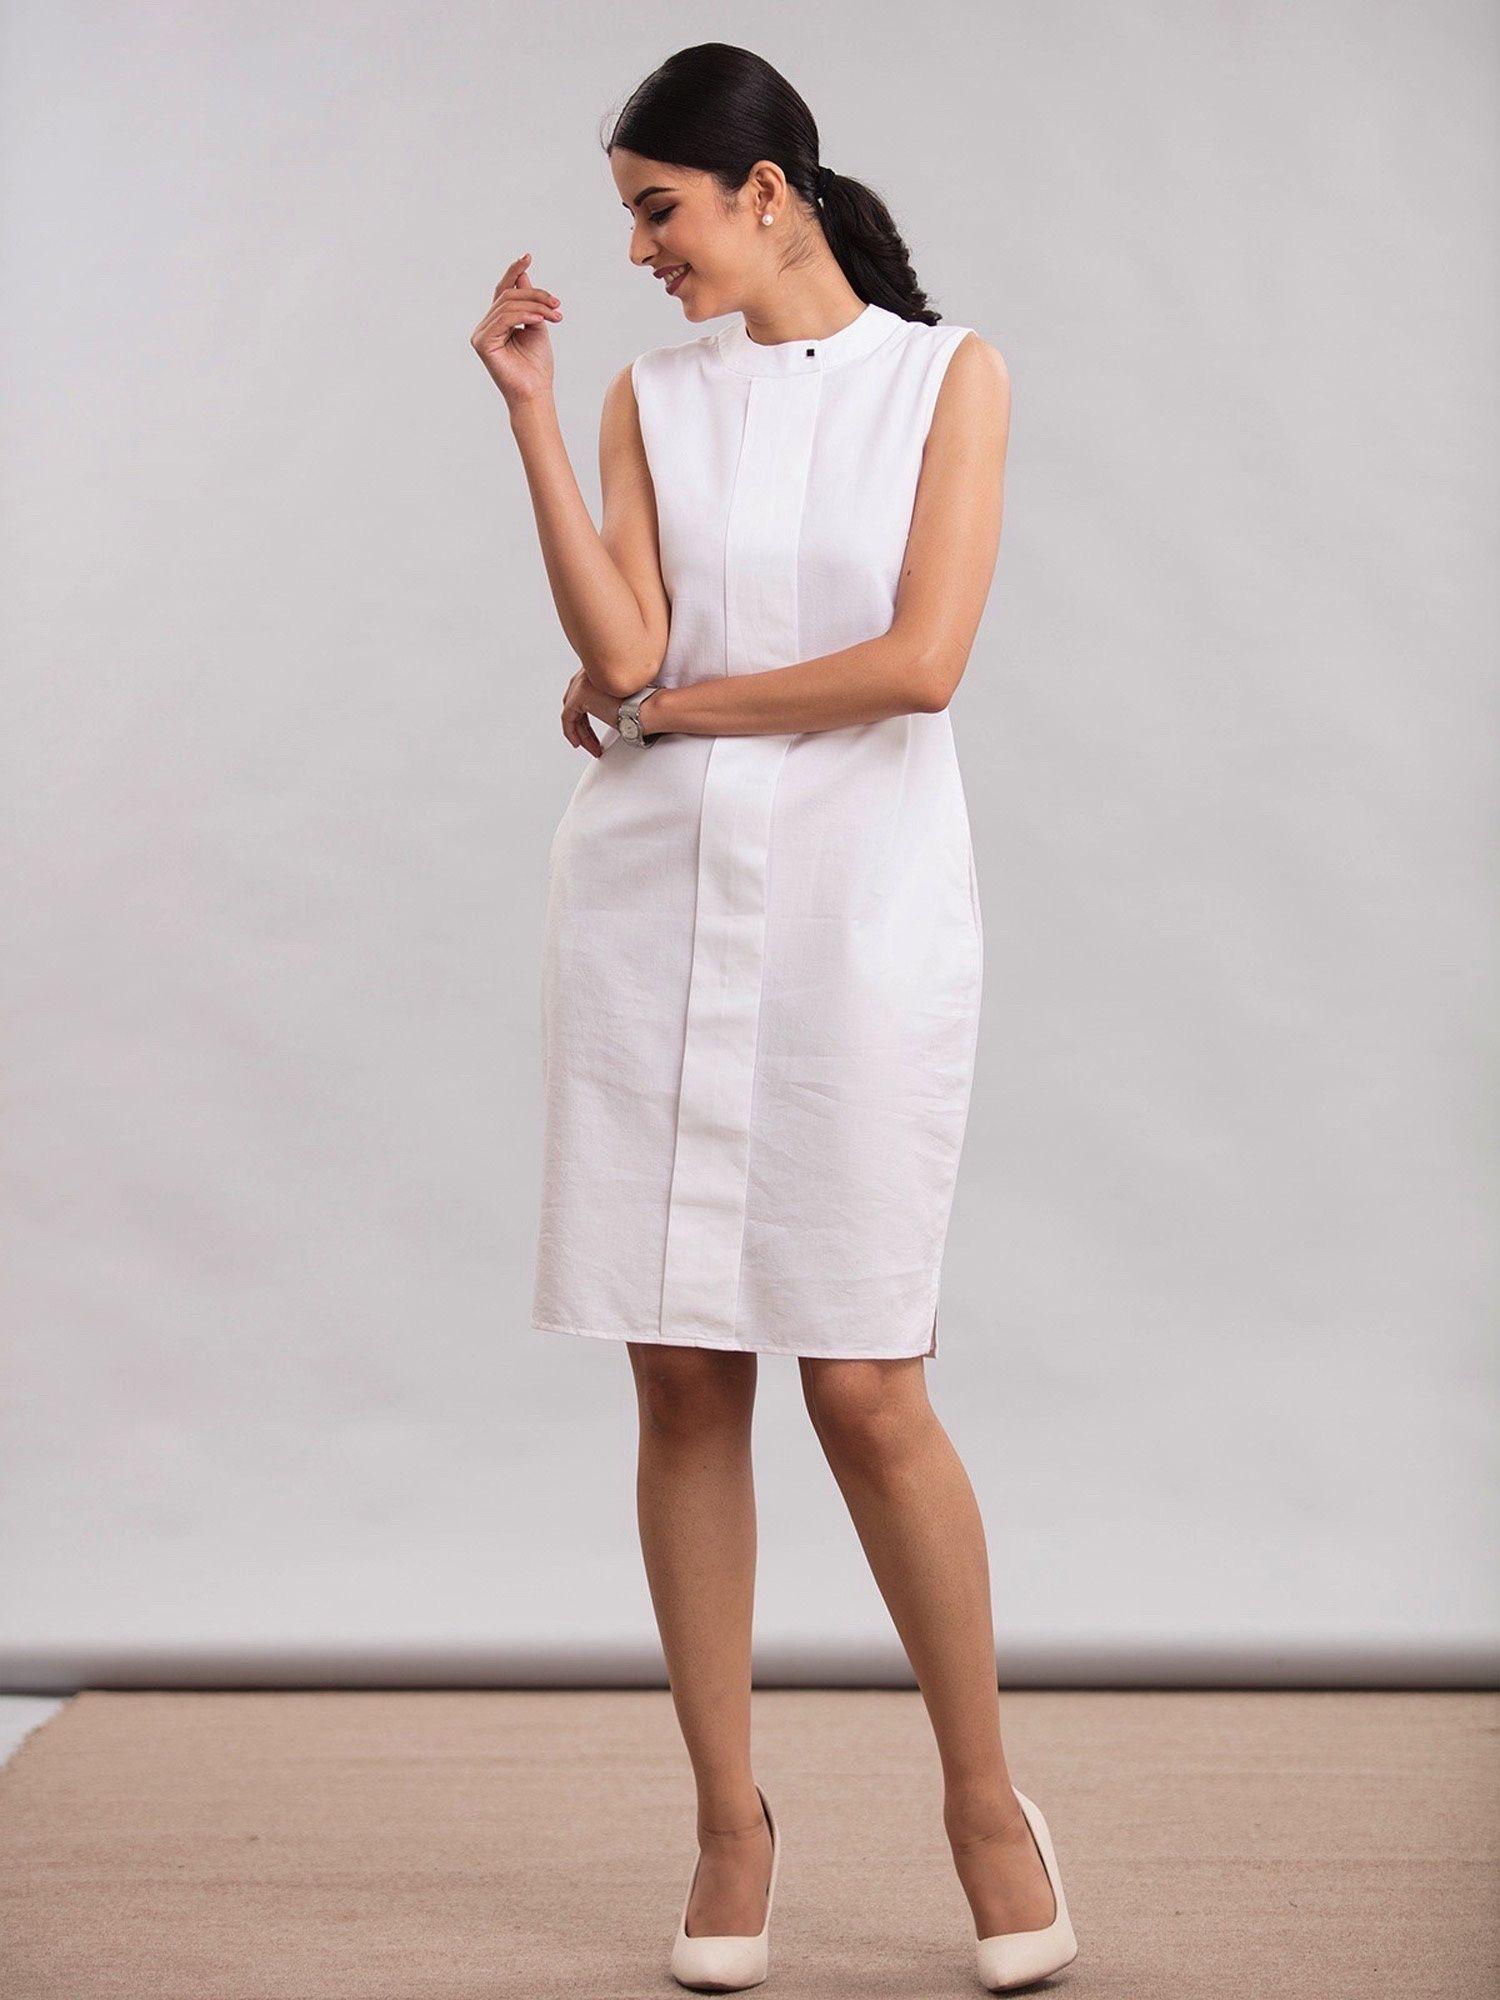 b519533176 FableStreet Dresses   Buy FableStreet Front Pleated Dress - White Online